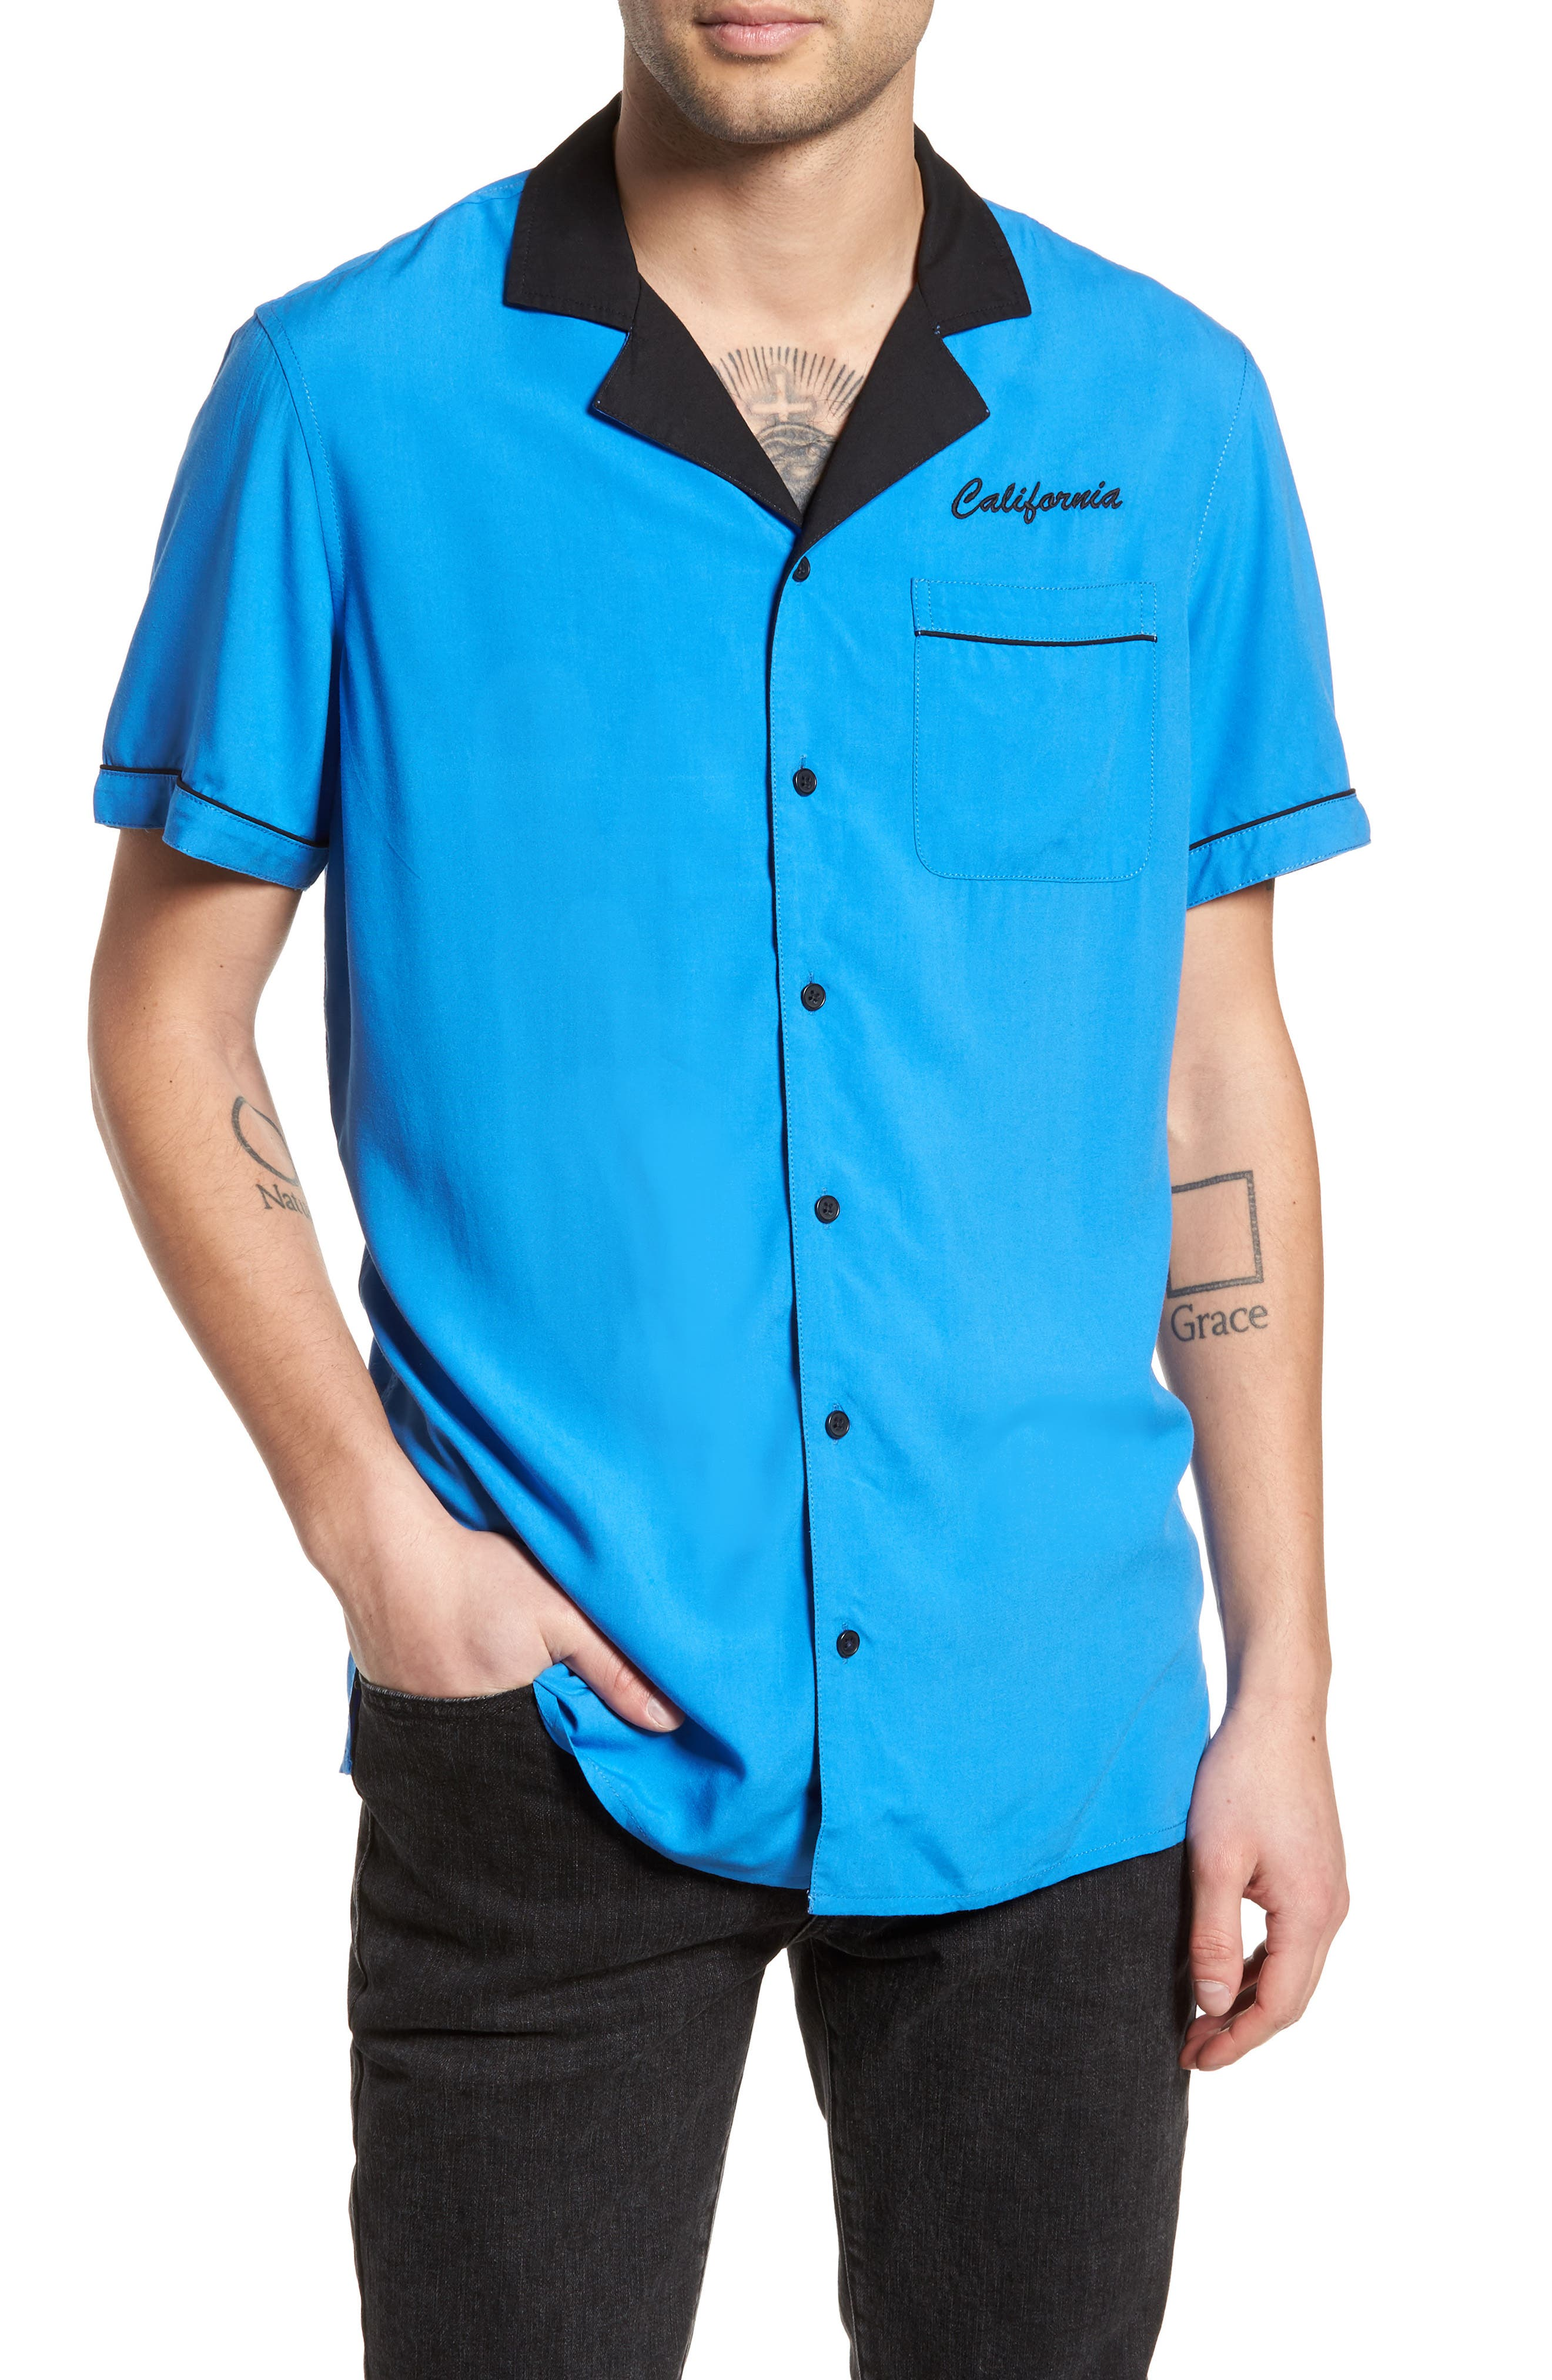 The Rail Bowling Shirt